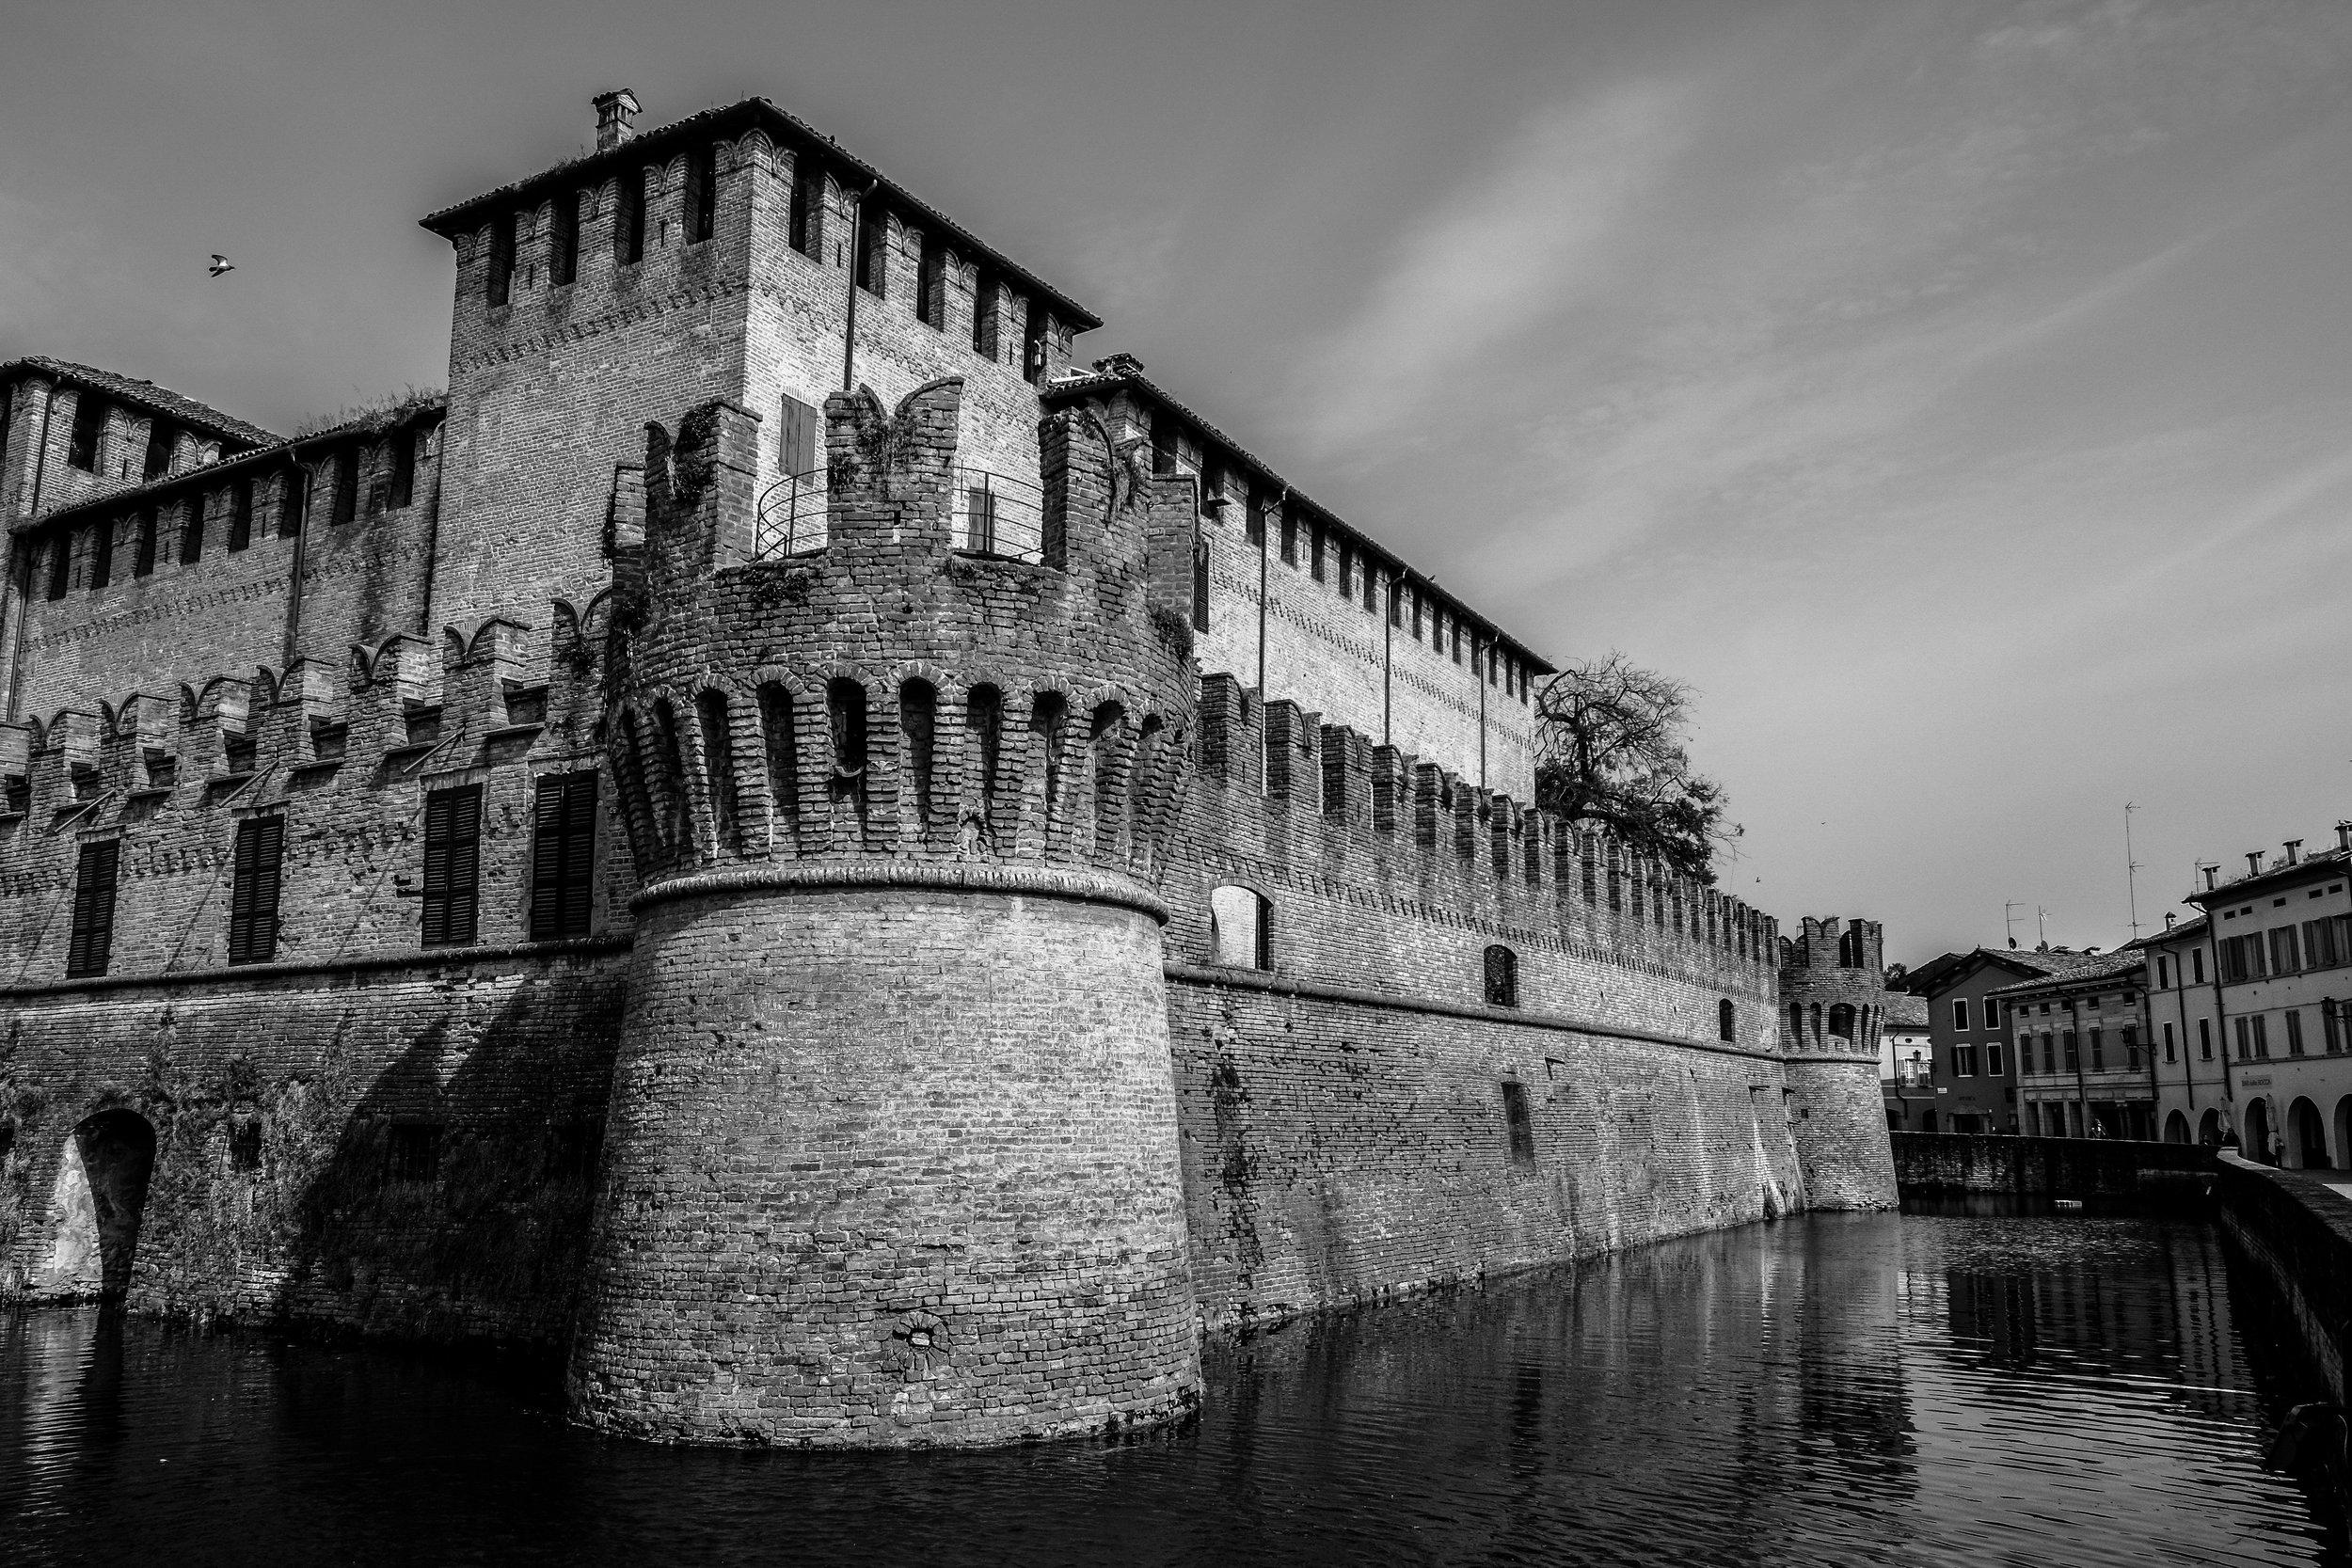 ancient-architecture-black-white-97294.jpg